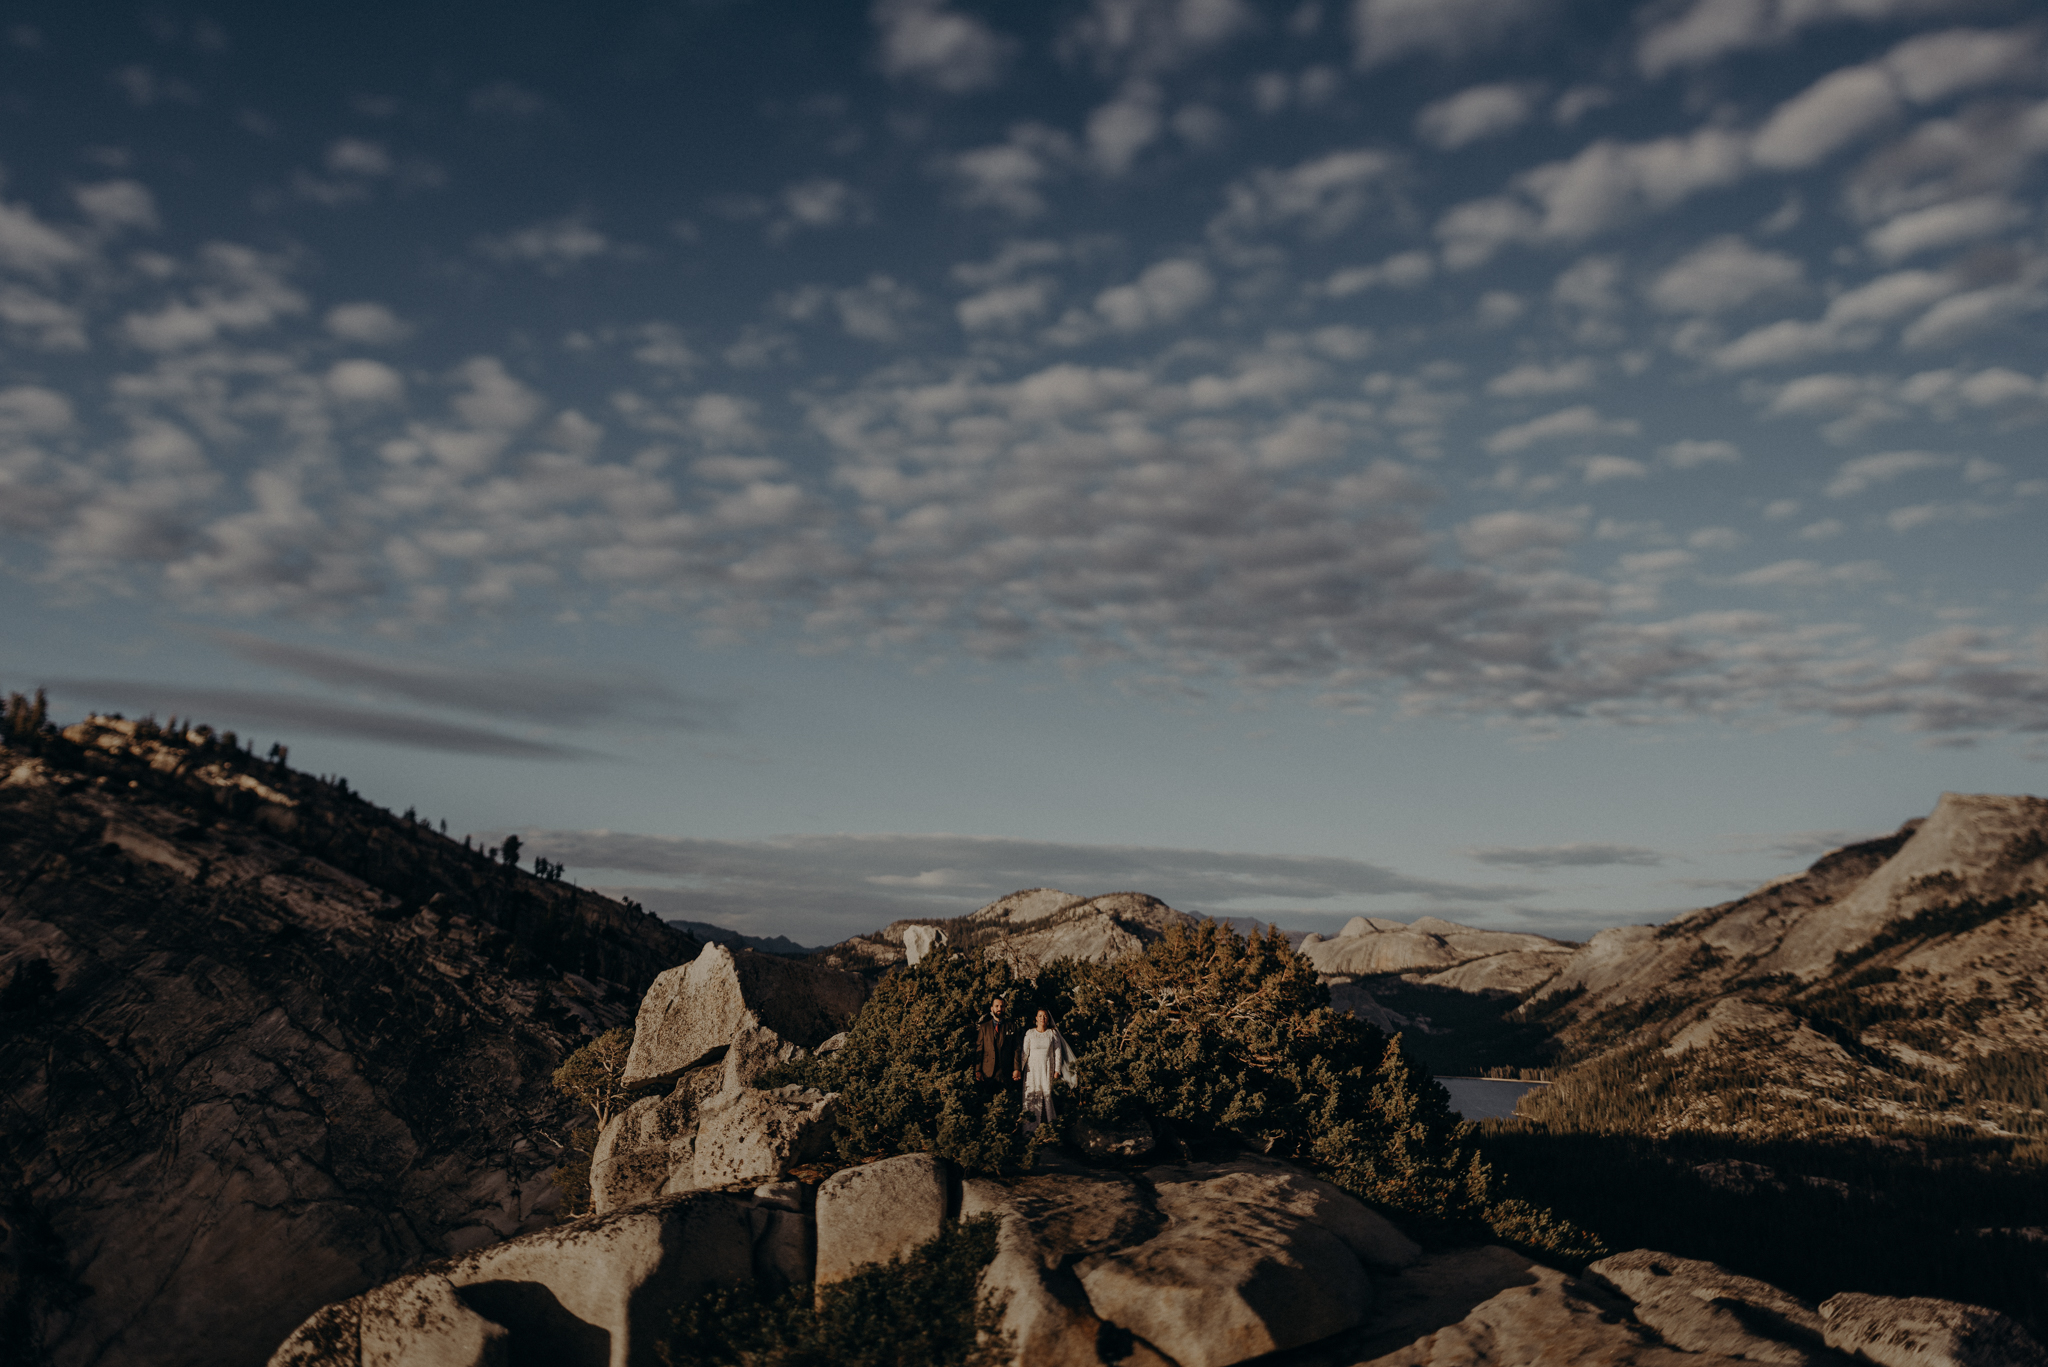 Yosemite Elopement Photographer - Evergreen Lodge Wedding Photographer - IsaiahAndTaylor.com-032.jpg